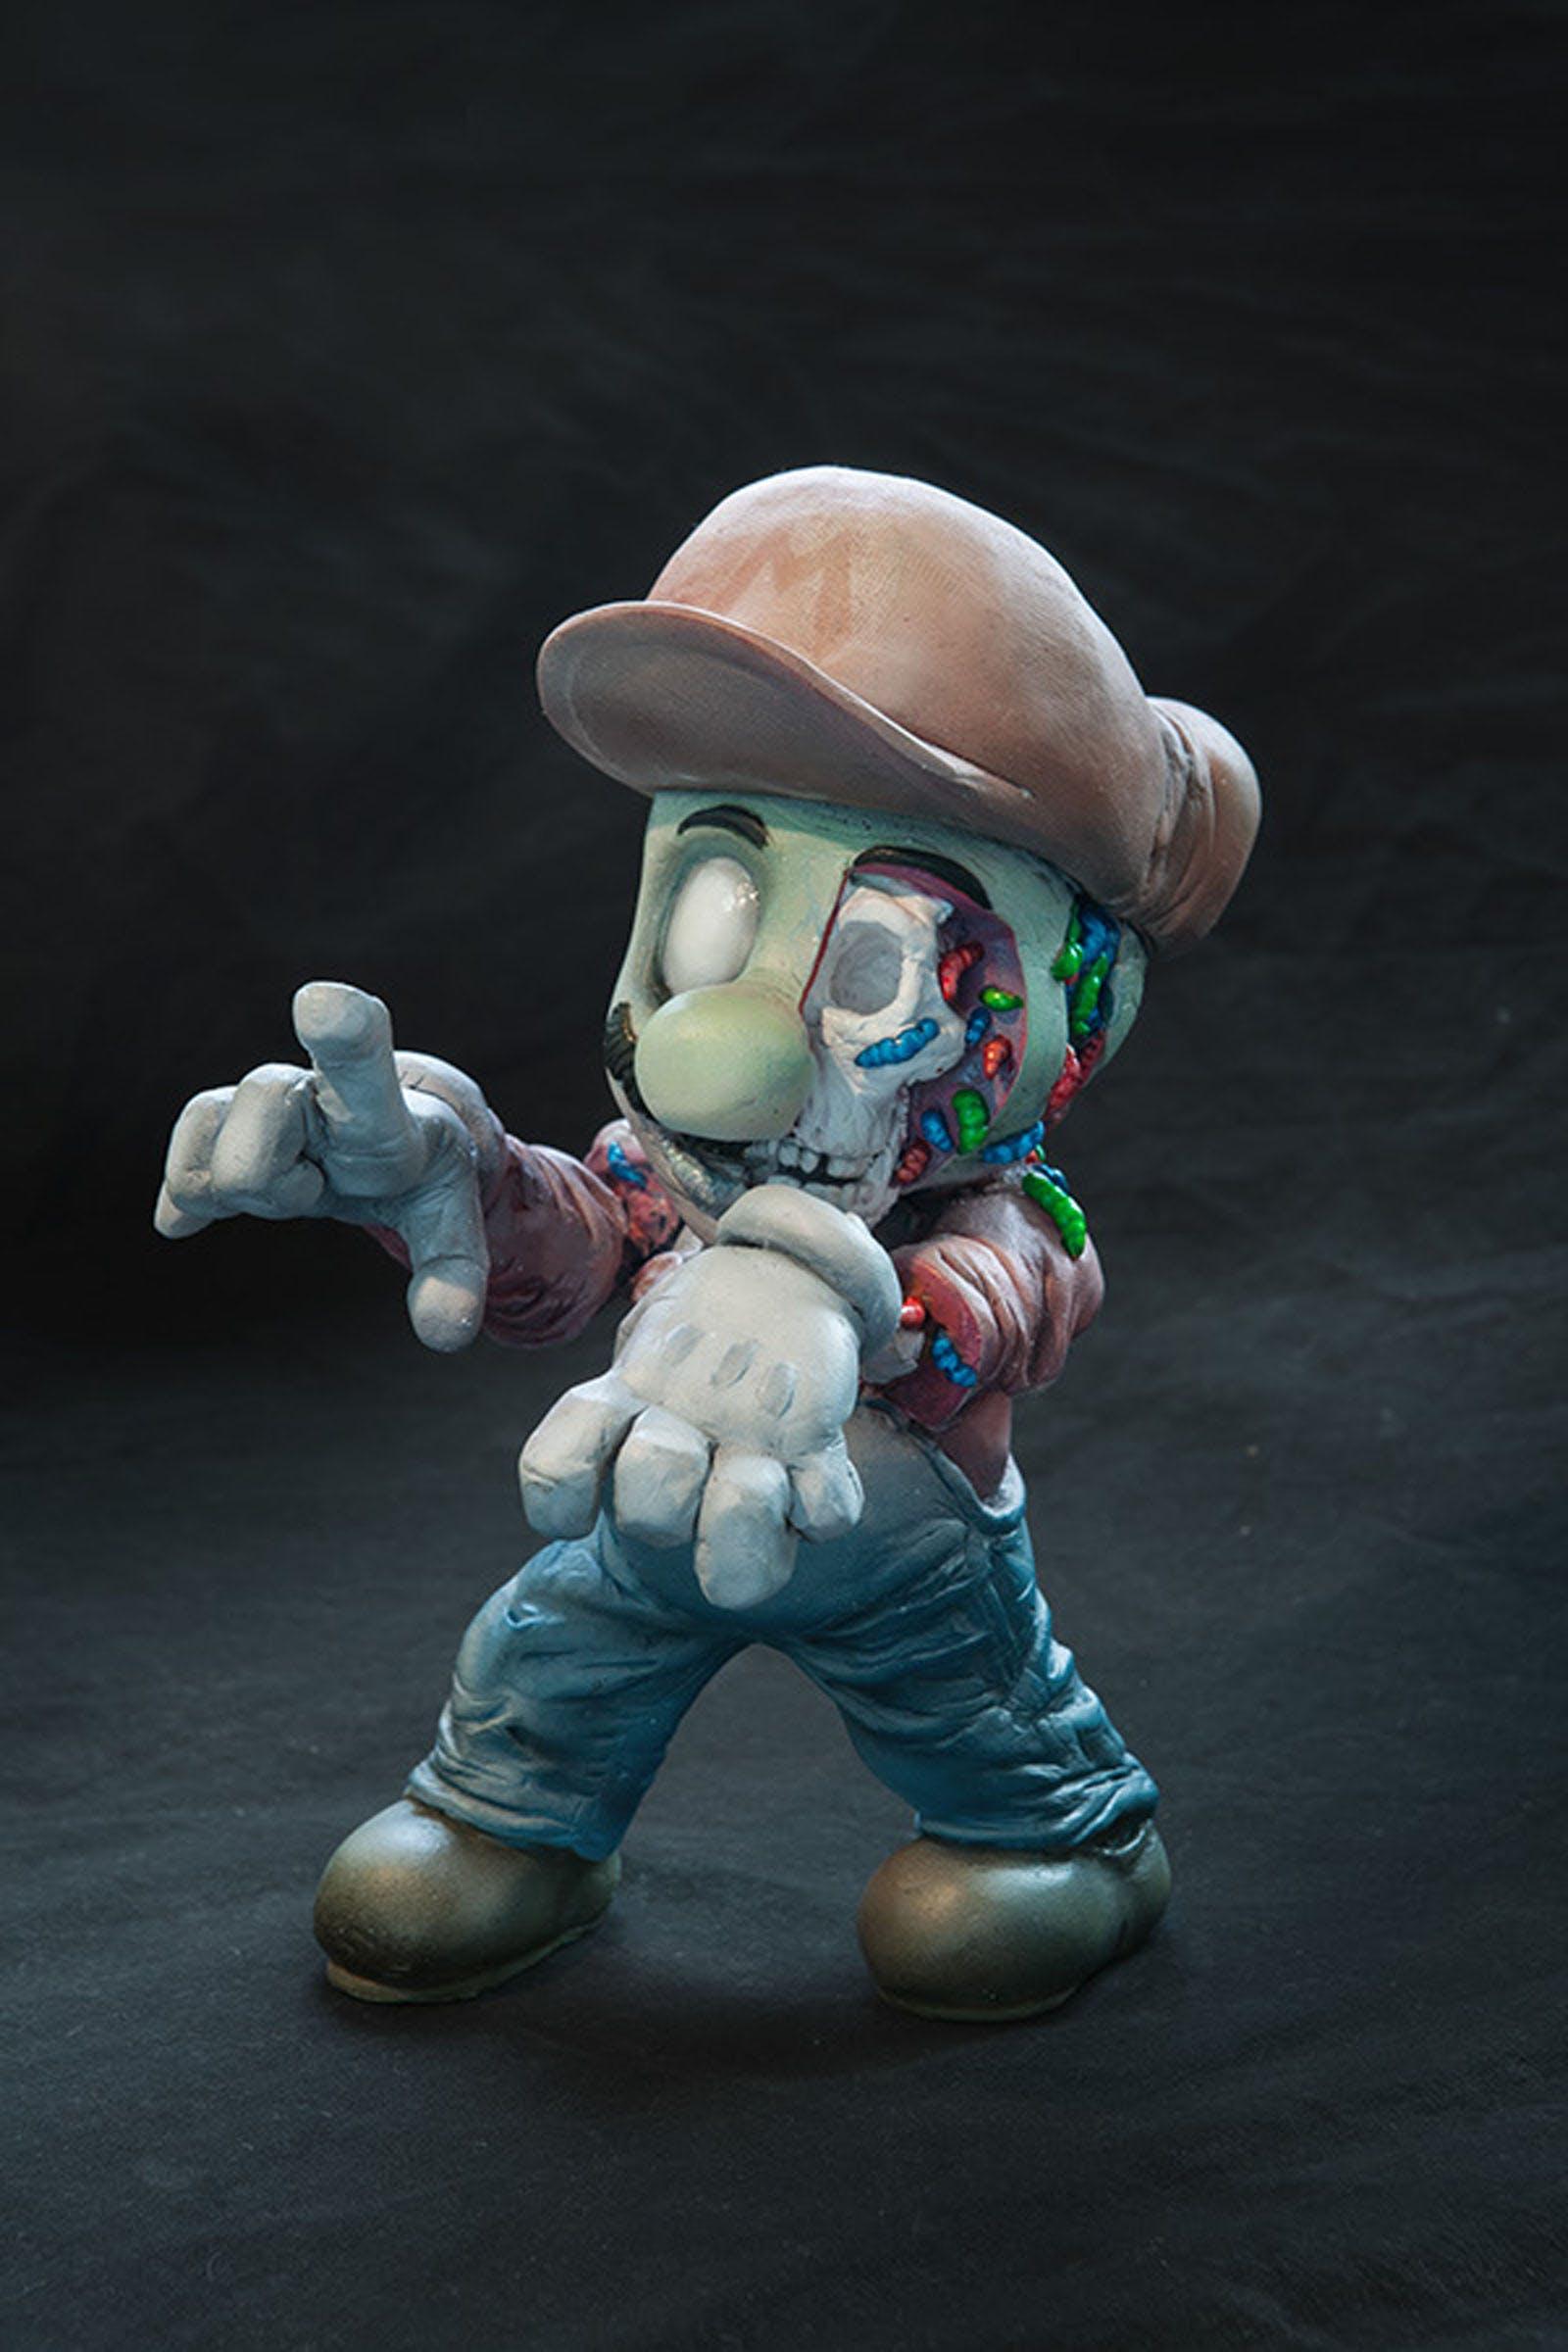 Free stock photo of supermario zombie